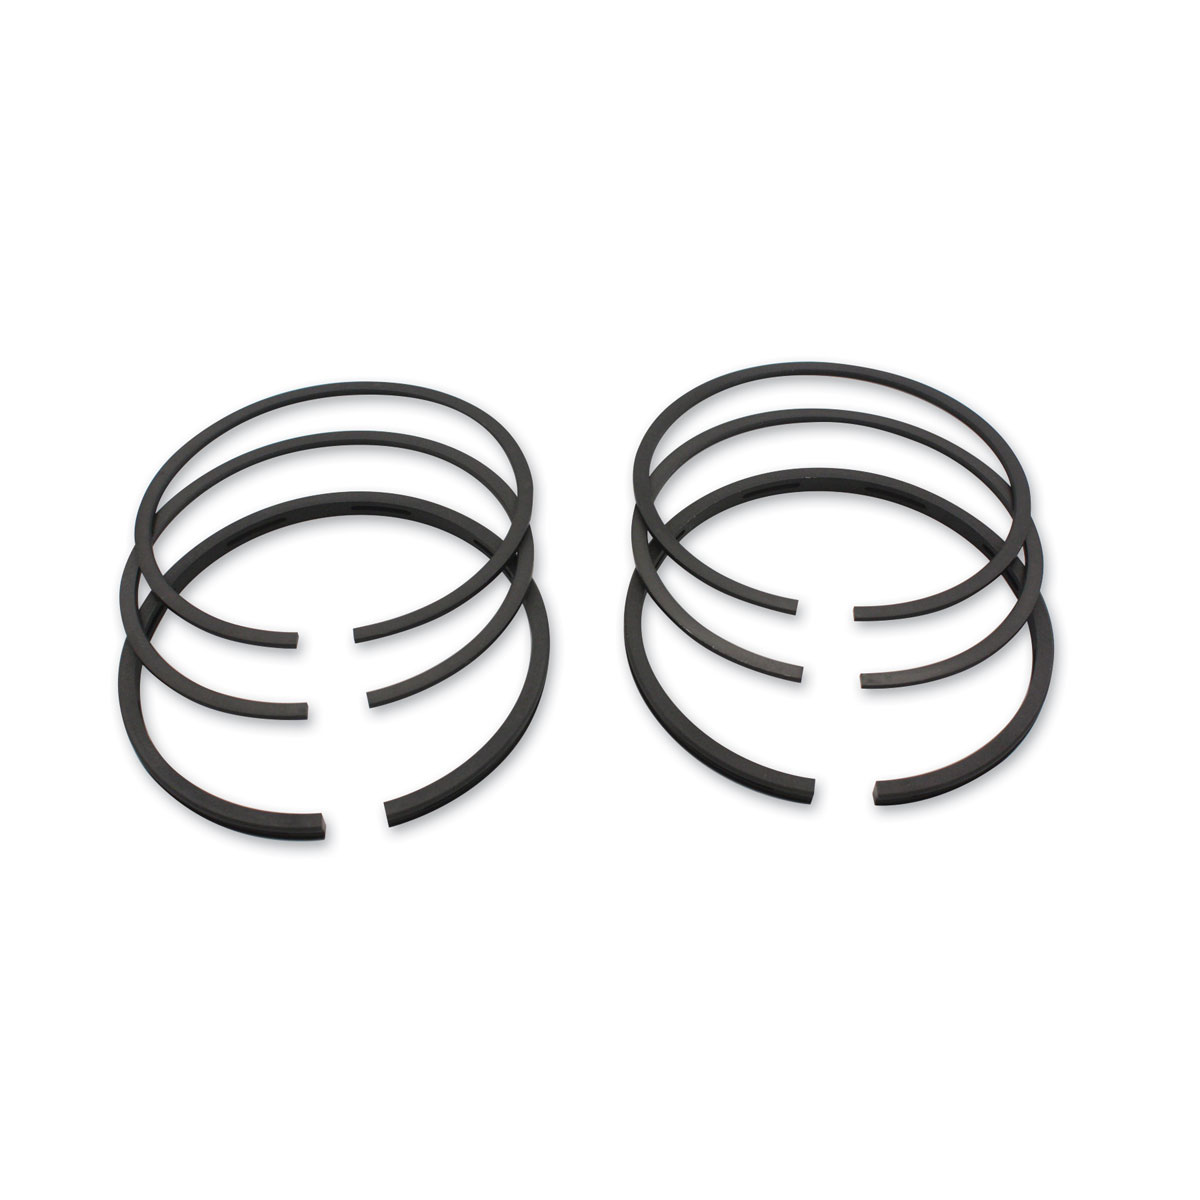 Hastings Piston Ring Set .060 Oversize